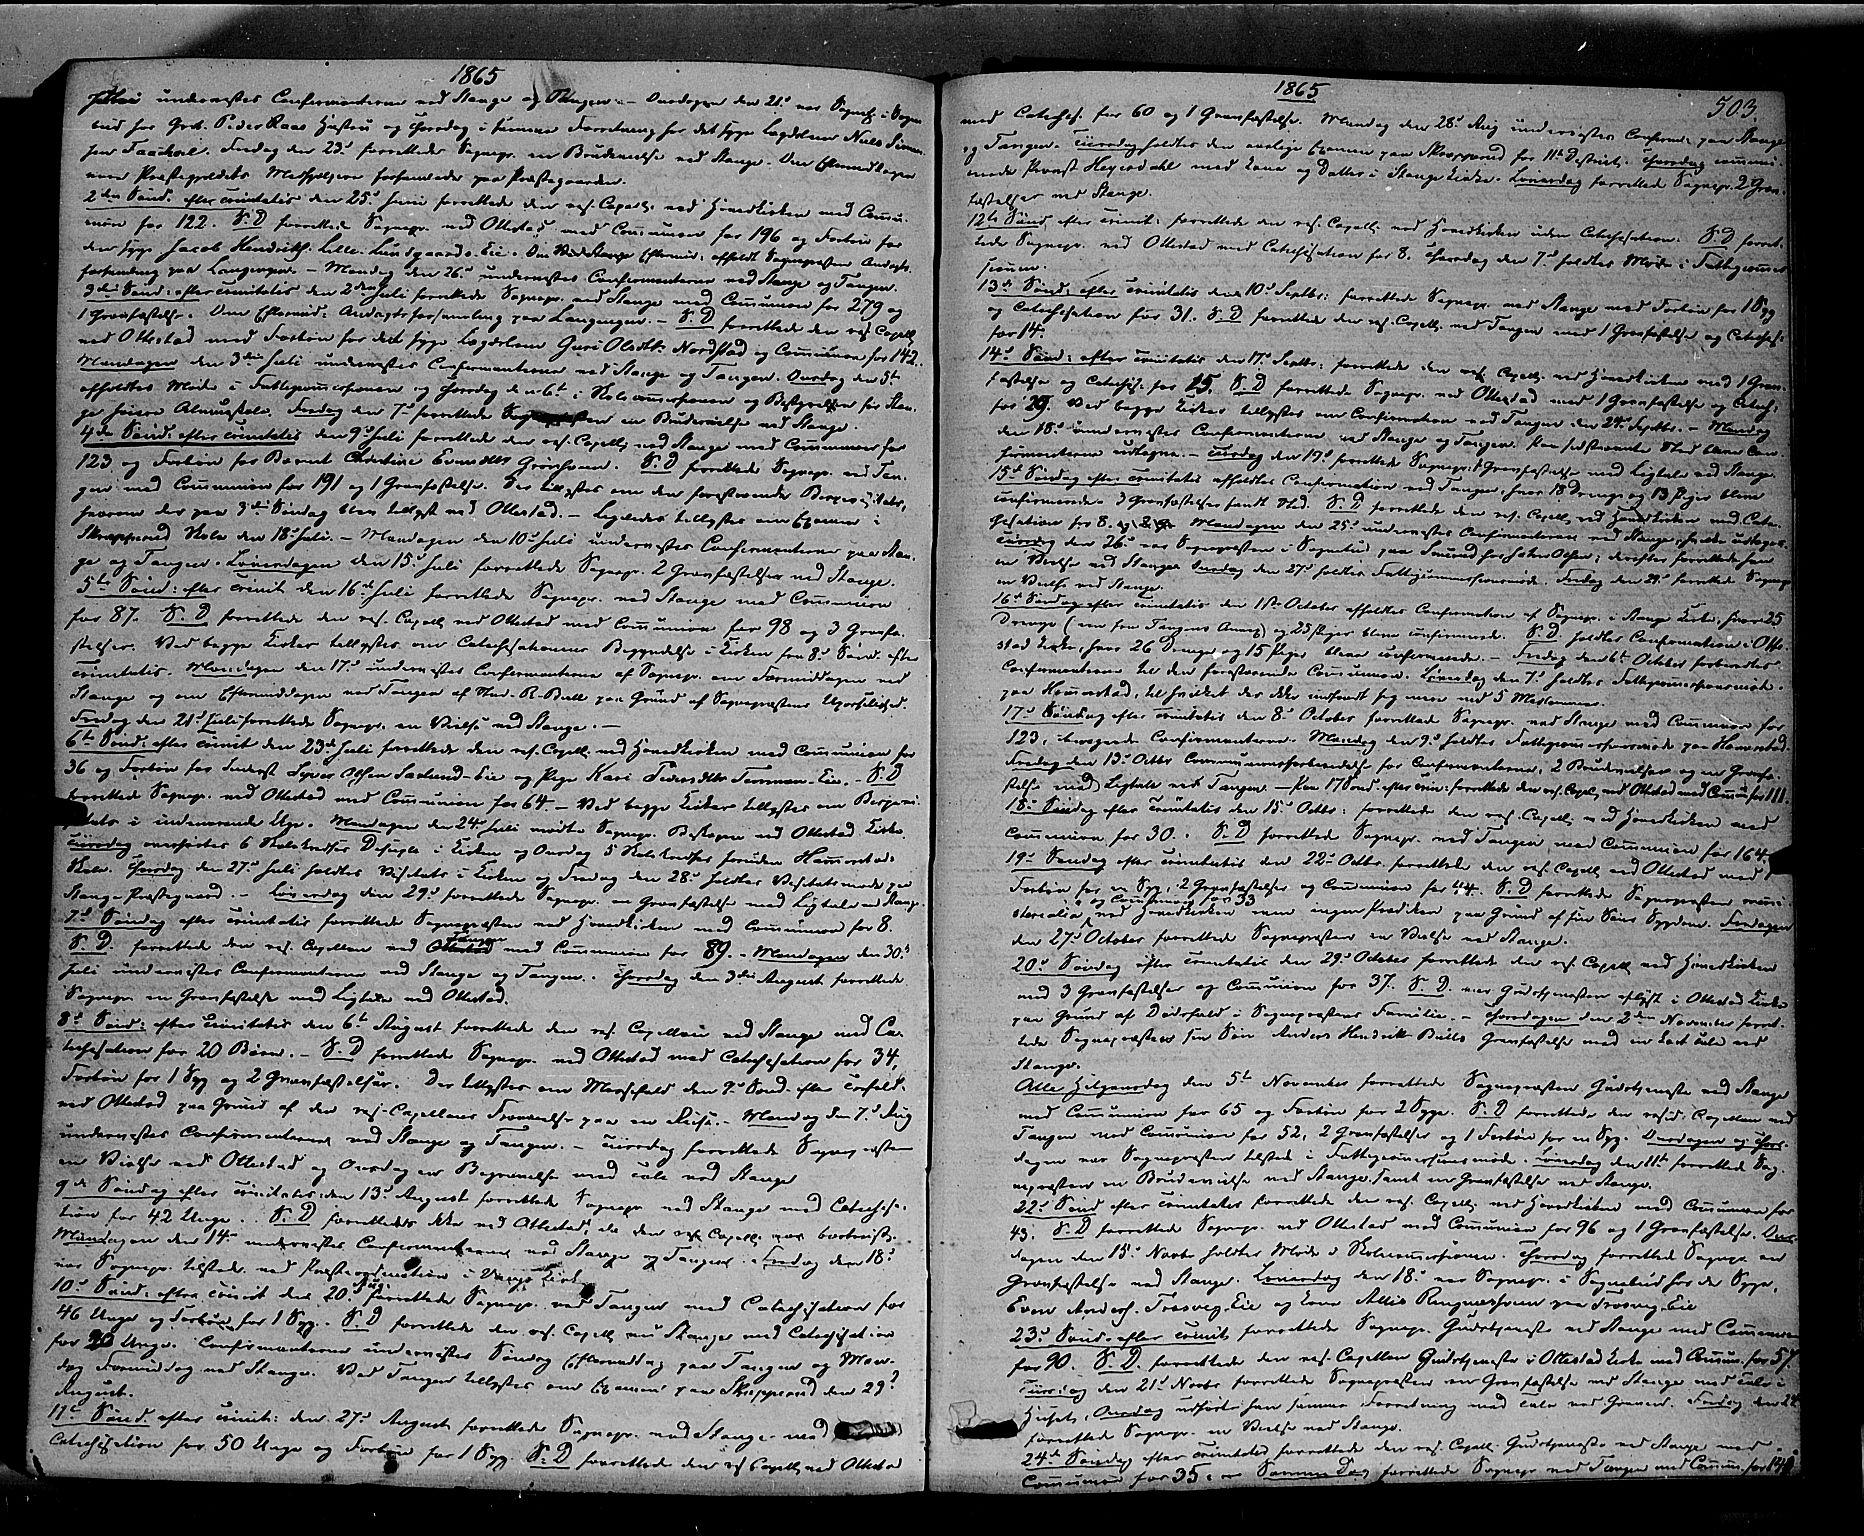 SAH, Stange prestekontor, K/L0013: Ministerialbok nr. 13, 1862-1879, s. 503